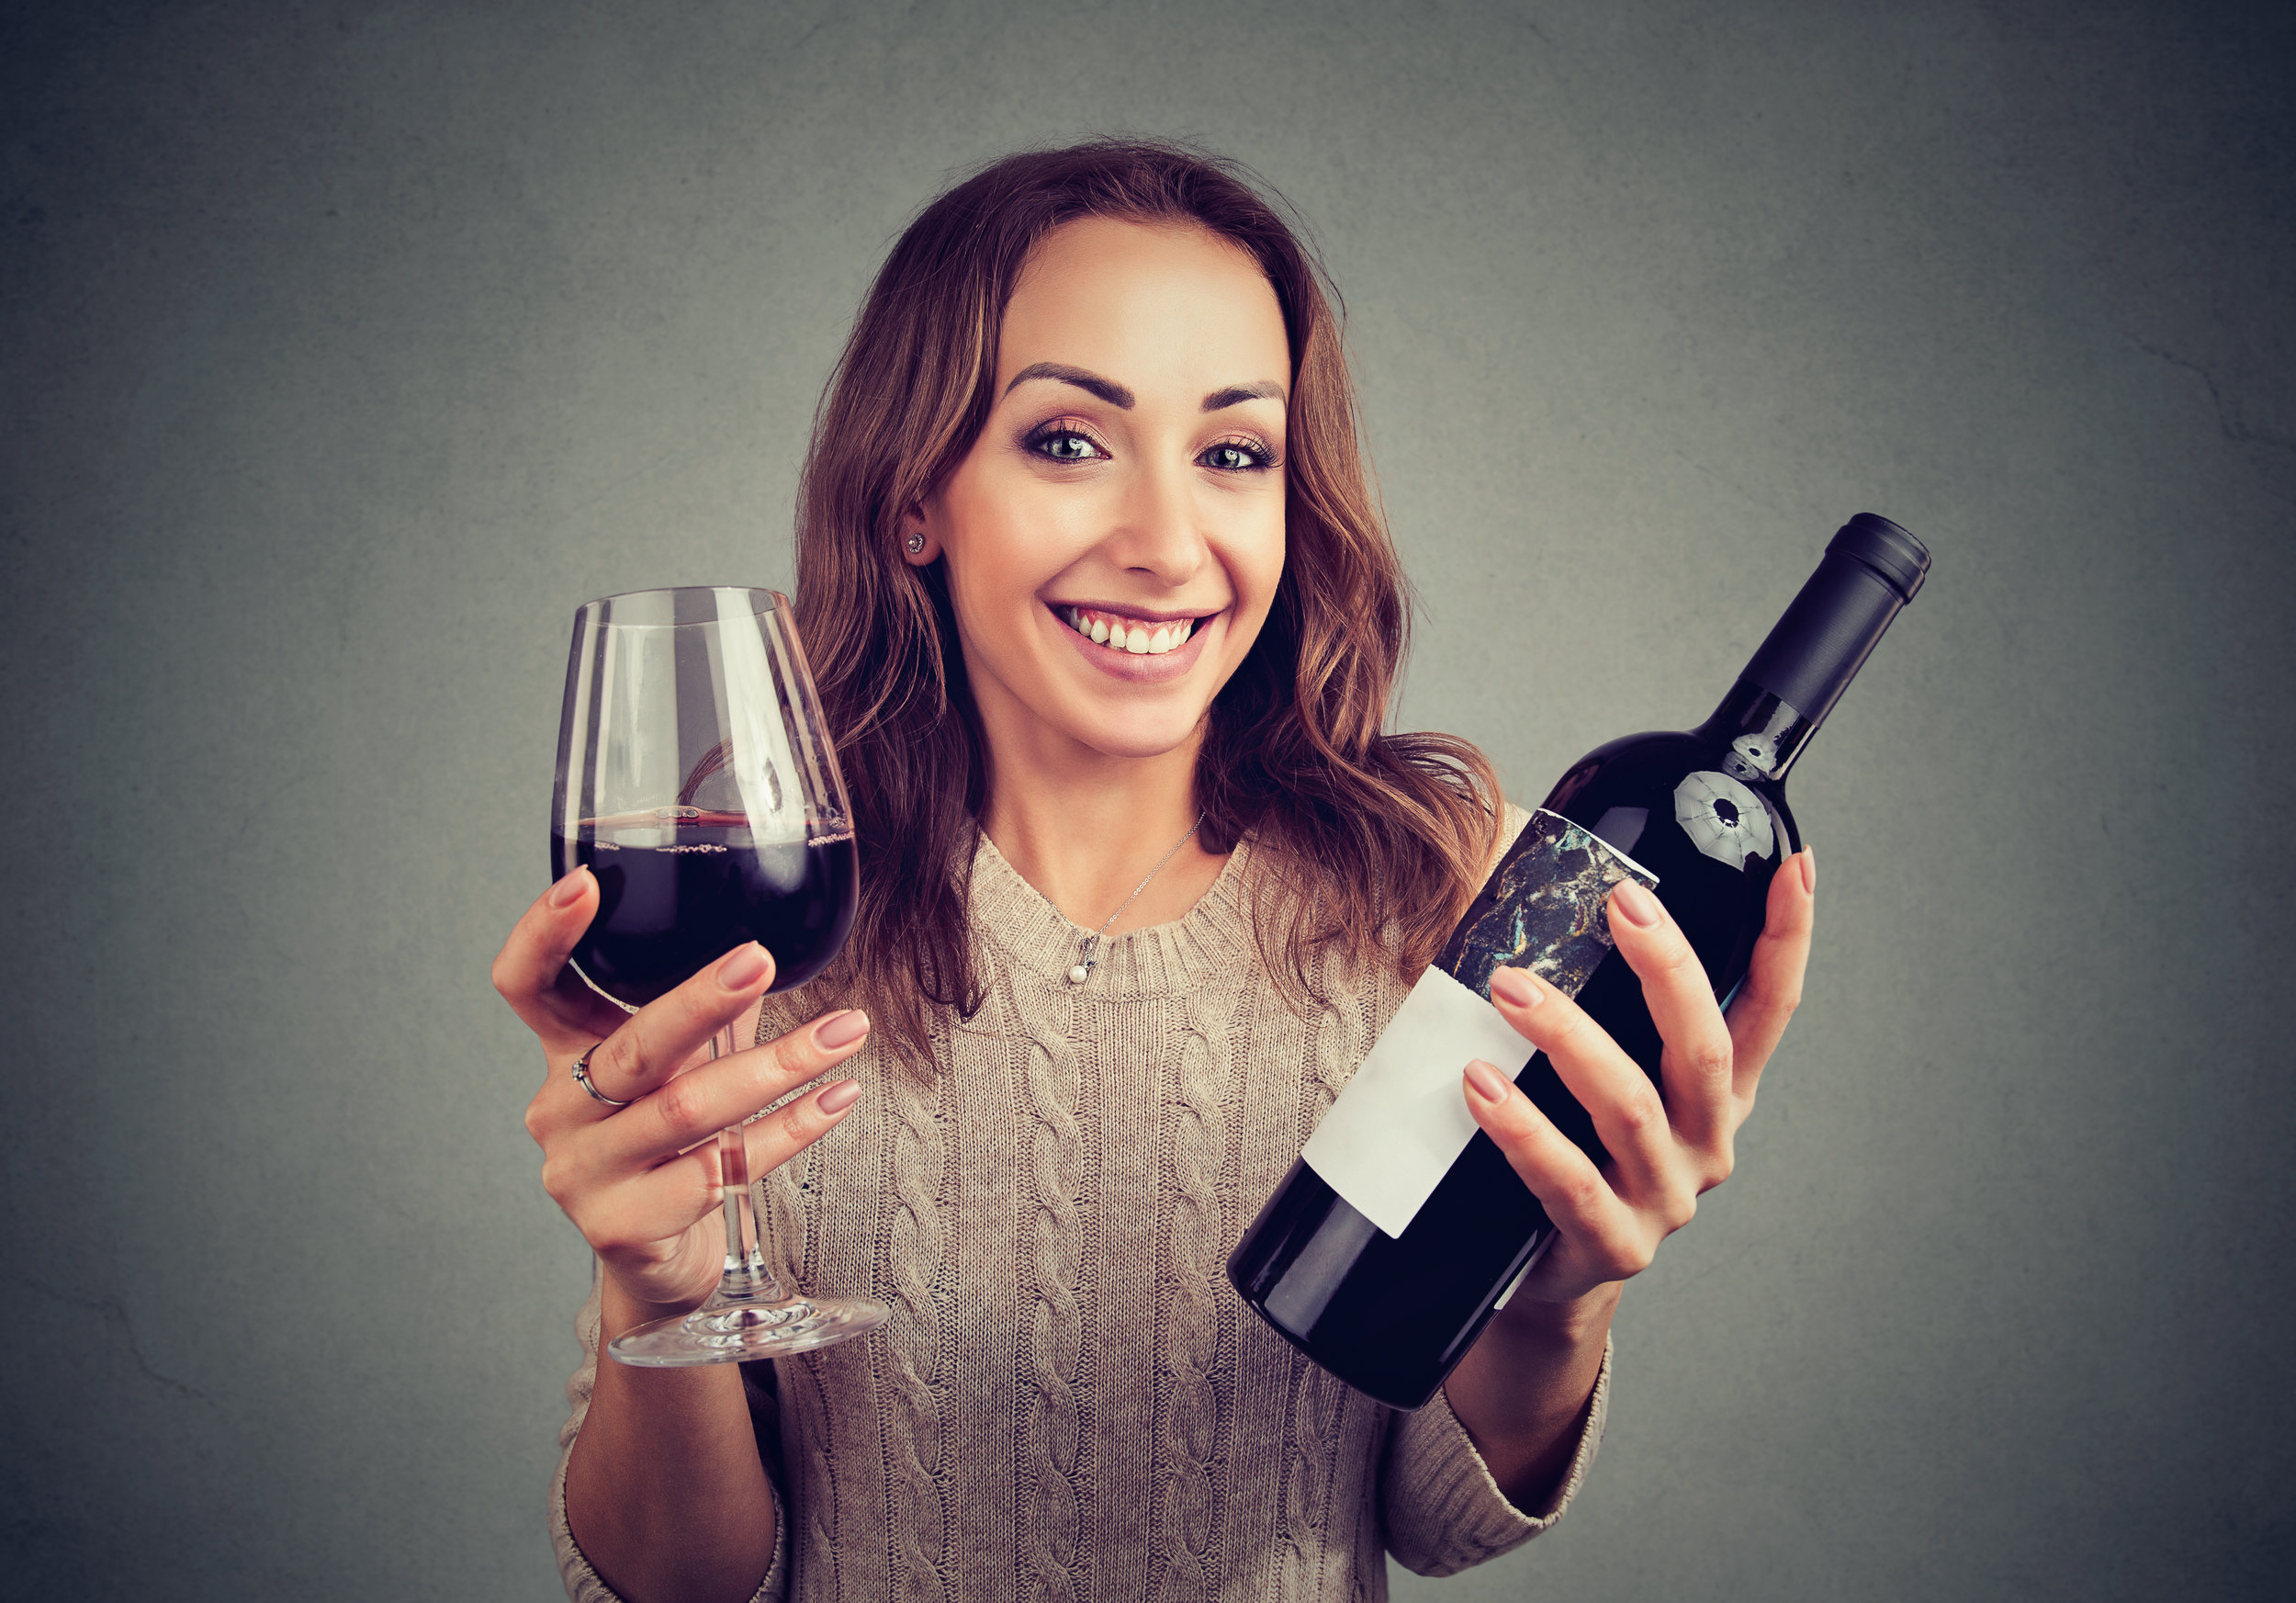 Charming-girl-enjoying-delicious-wine-920008102_5015x3500.jpeg